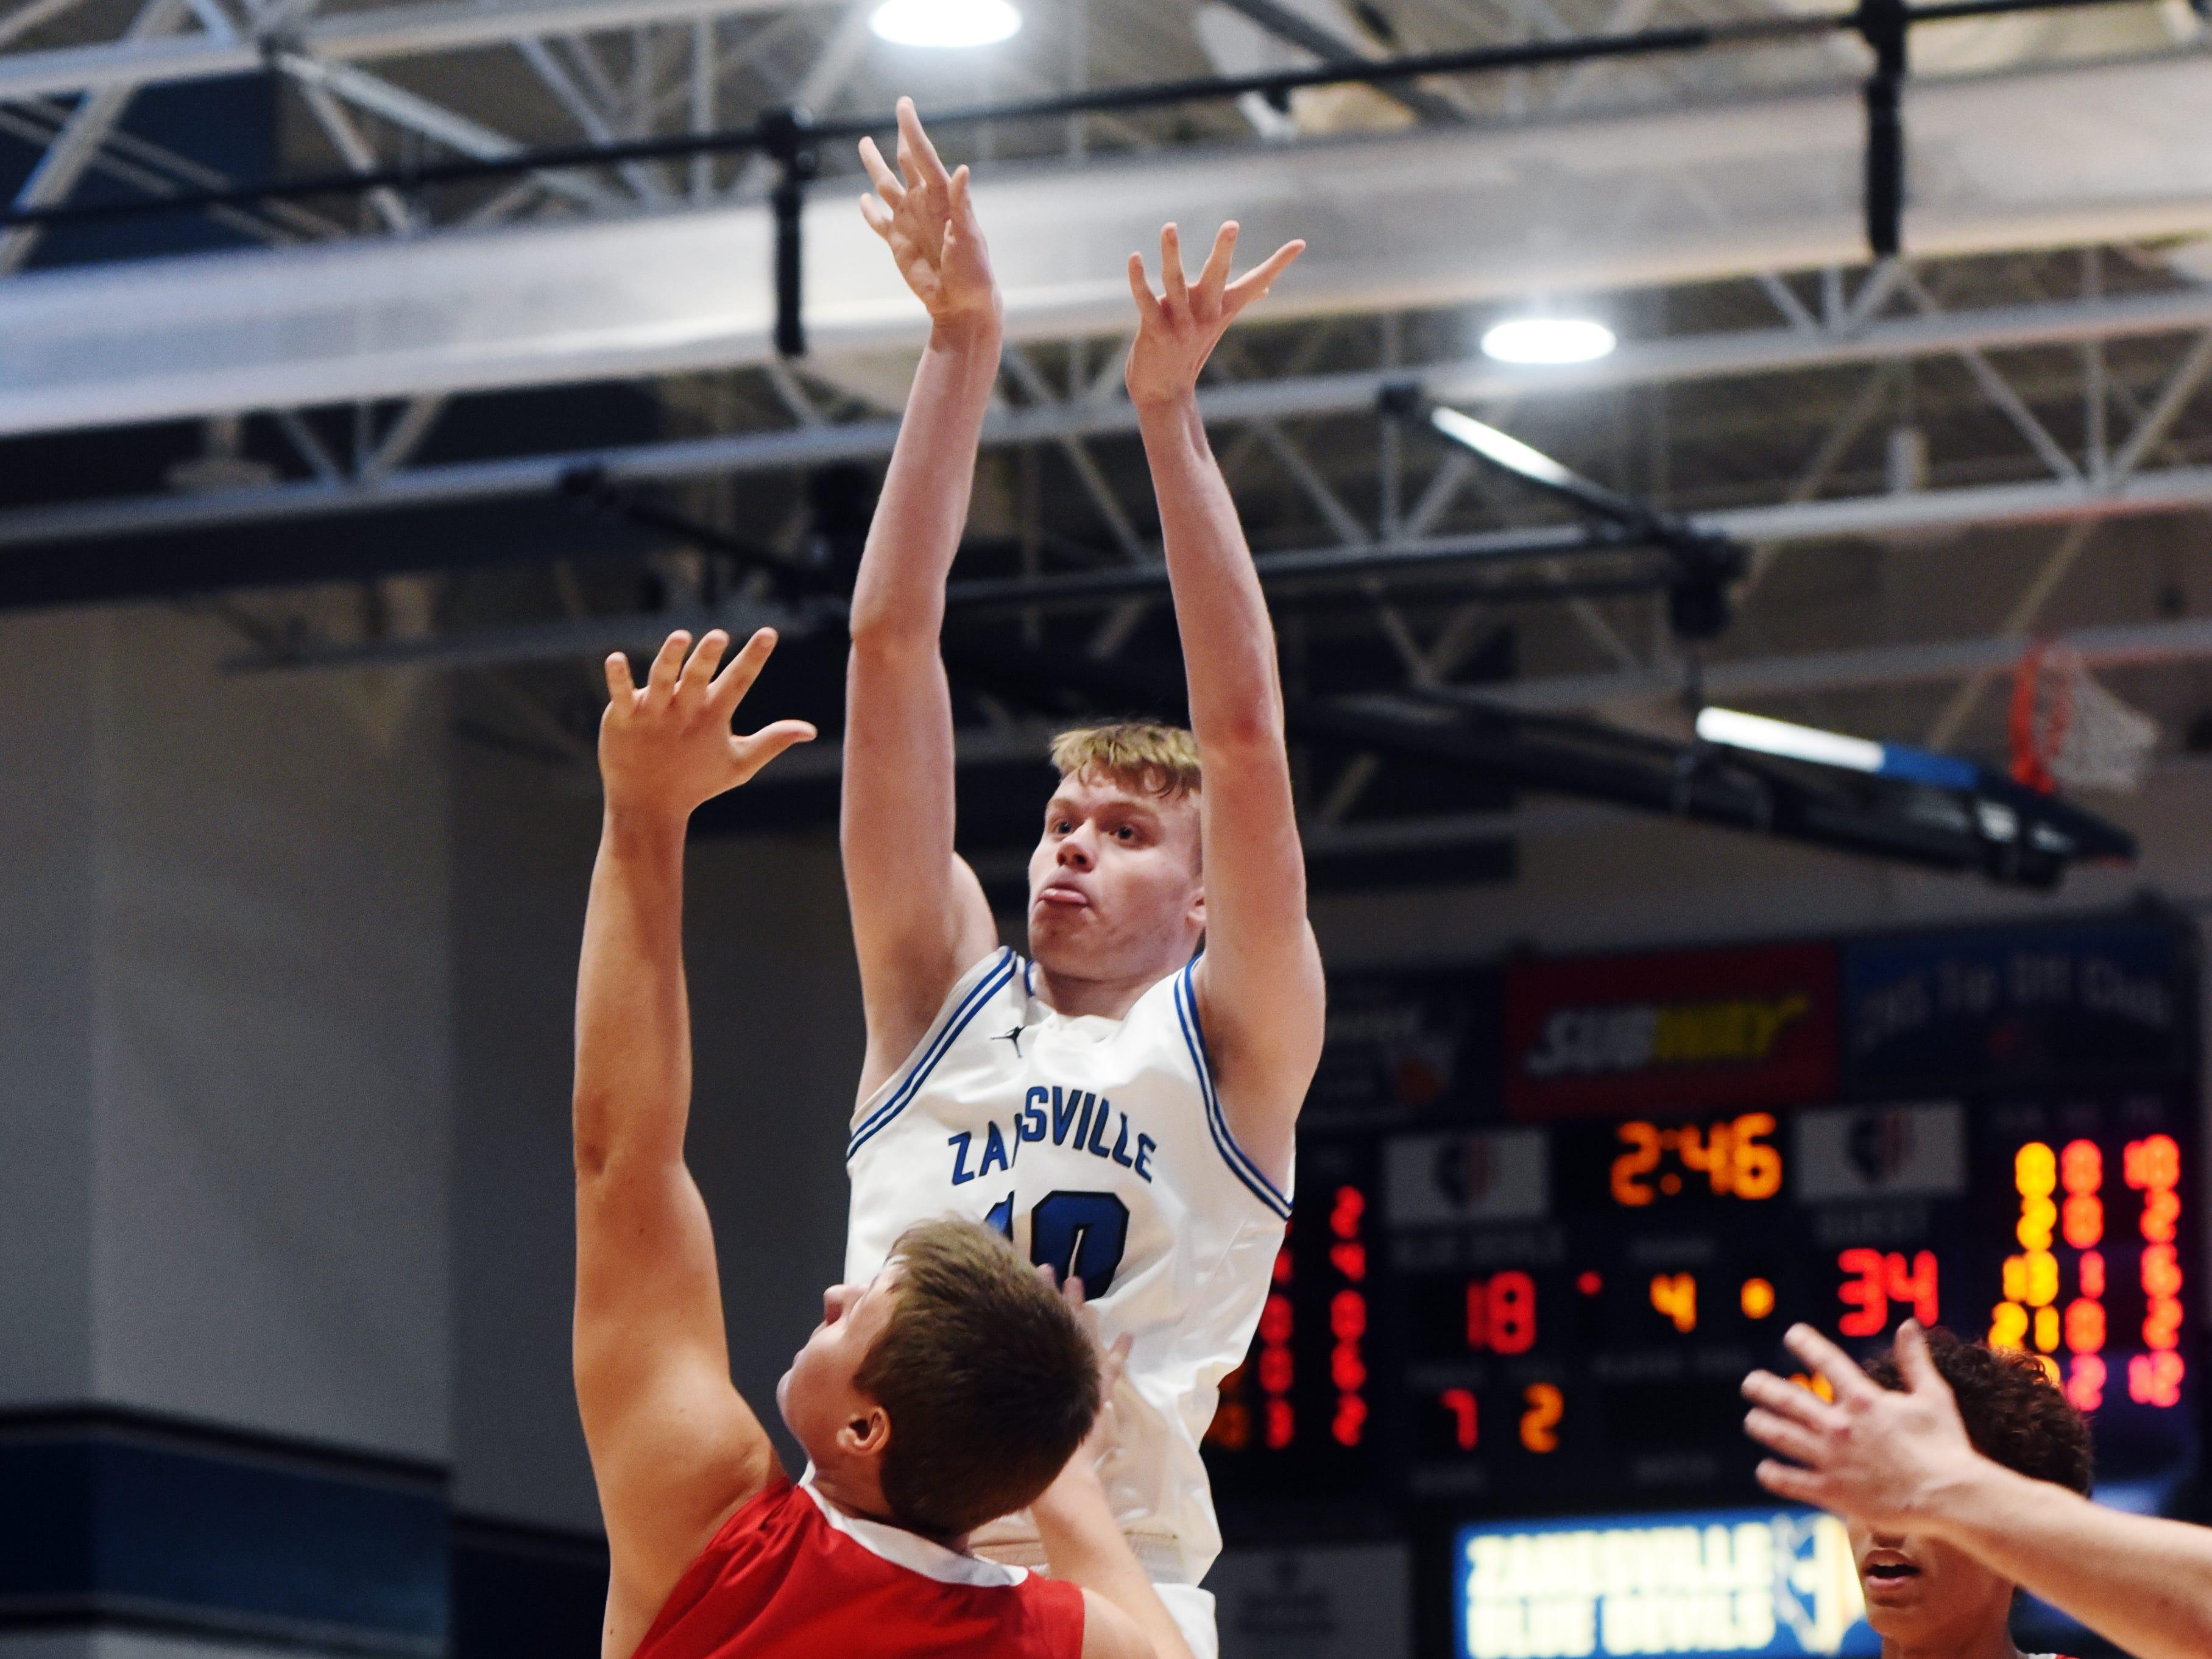 Brennan Reasoner shoots a jumper over Logan Desnder in Zanesville's 38-27 loss to visiting Coshocton on Friday night at Winland Memorial Gymnasium.